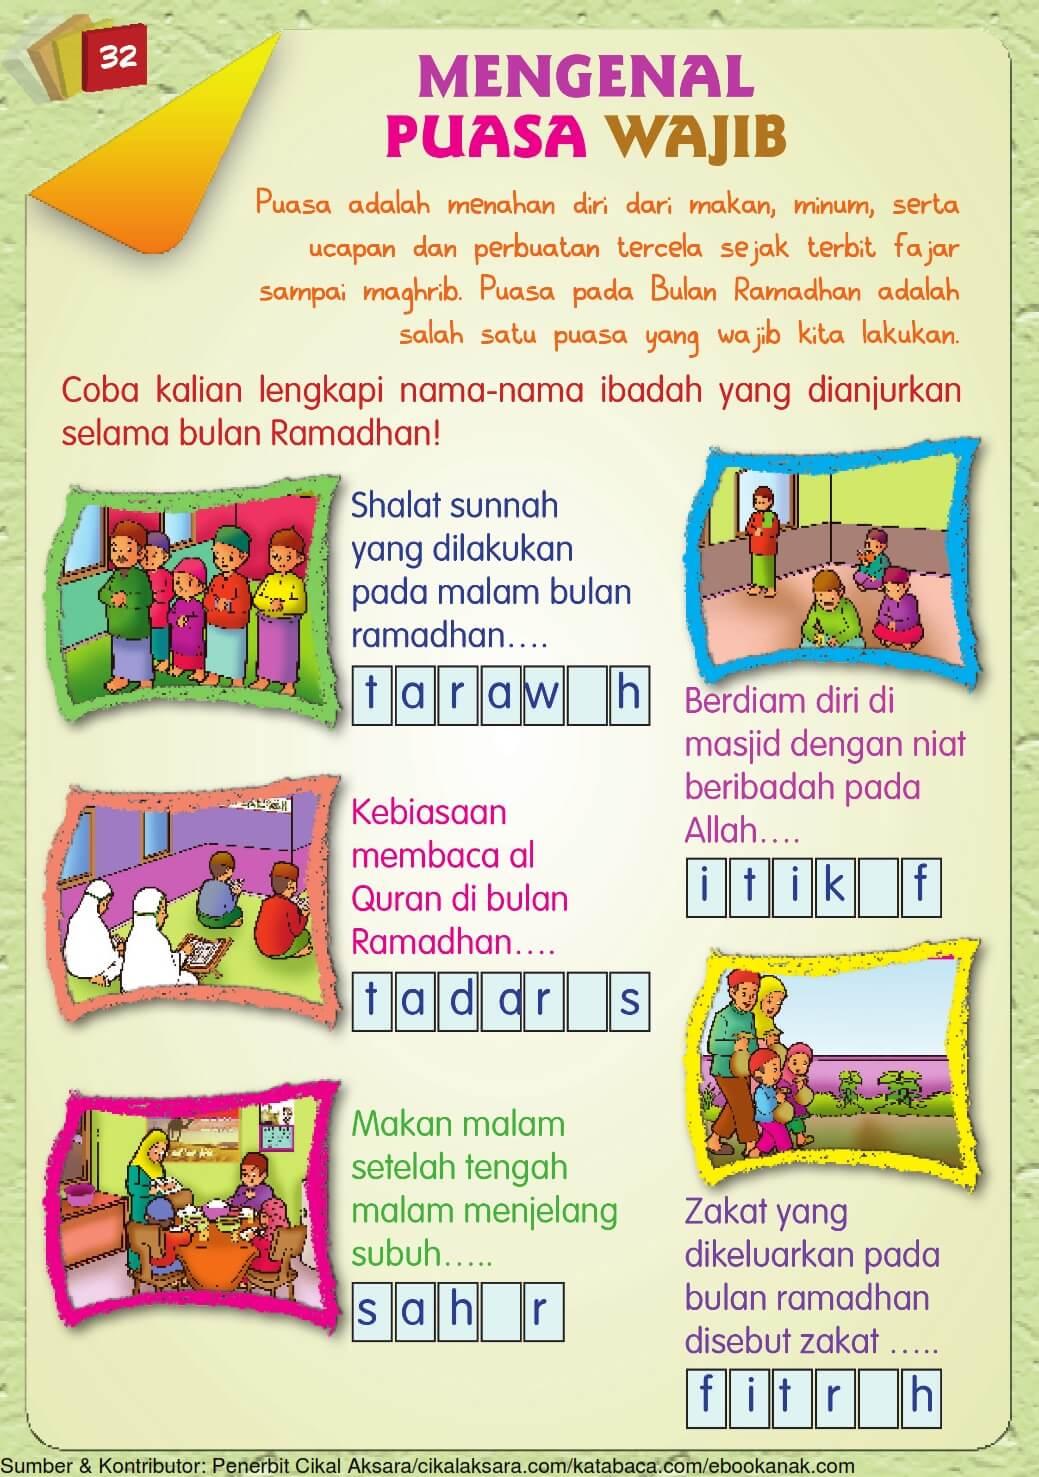 15 Buku Pintar Aktivitas Anak Shaleh, Mengenal Puasa Wajib 20 ...